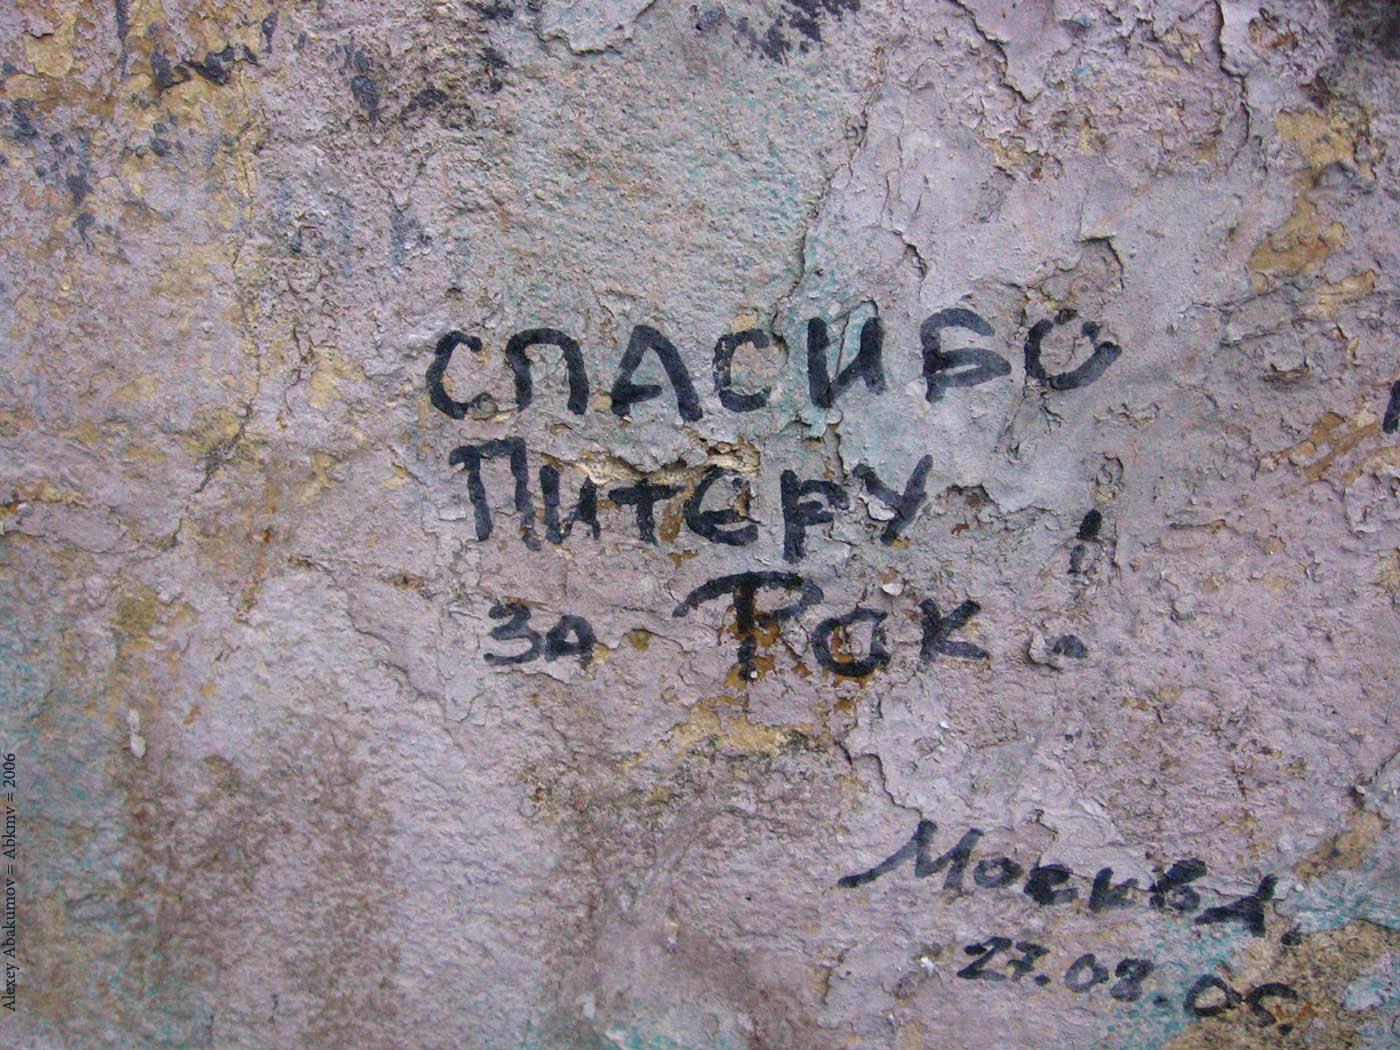 """Спасибо Питеру за рок"". Рубинштейна, 13. Фото: Алексей Абакумов. Санкт-Петербург, 2006 год"